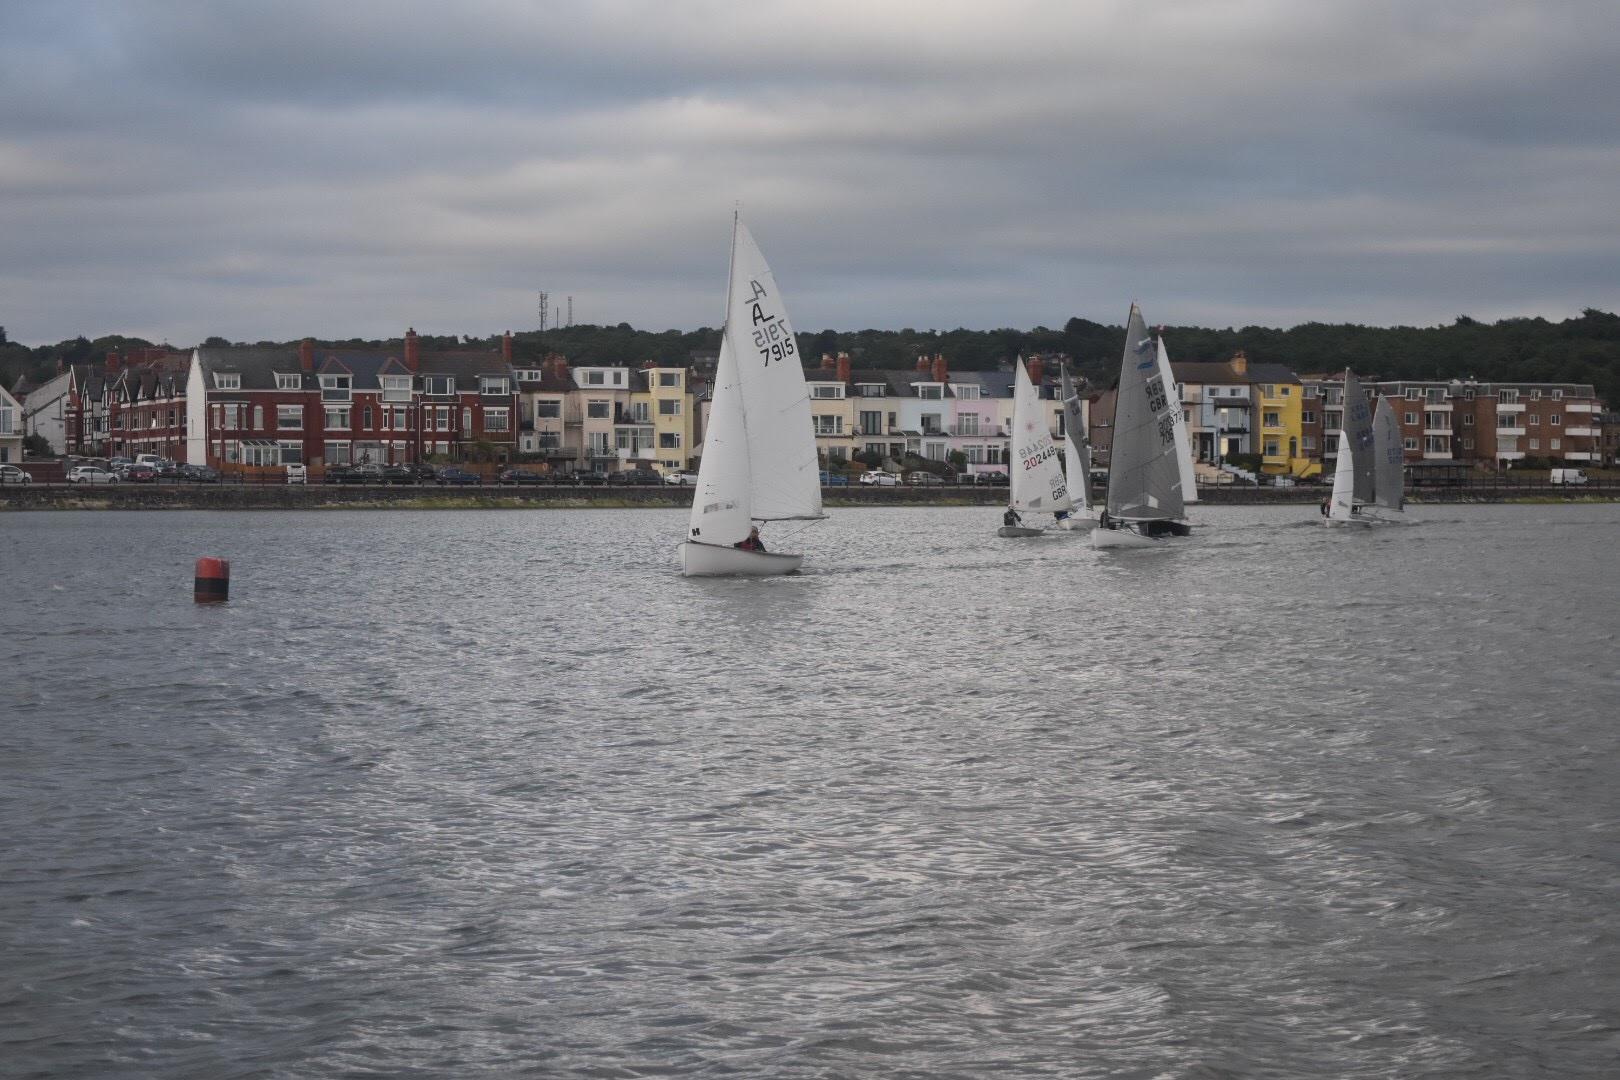 Boats on the Marine Lake